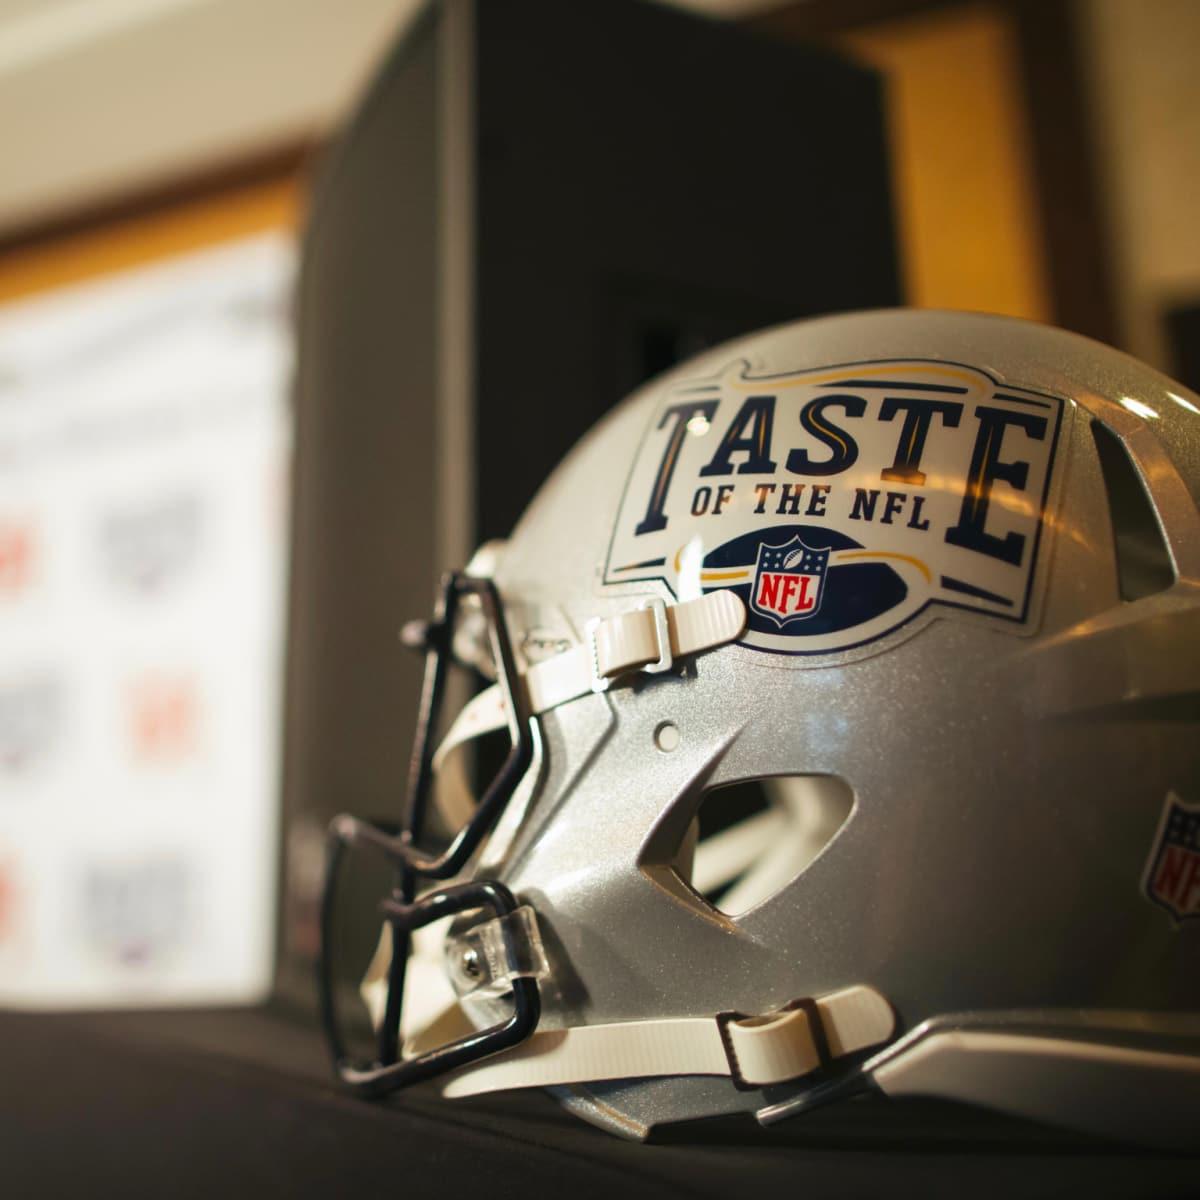 Taste of the NFL helmet